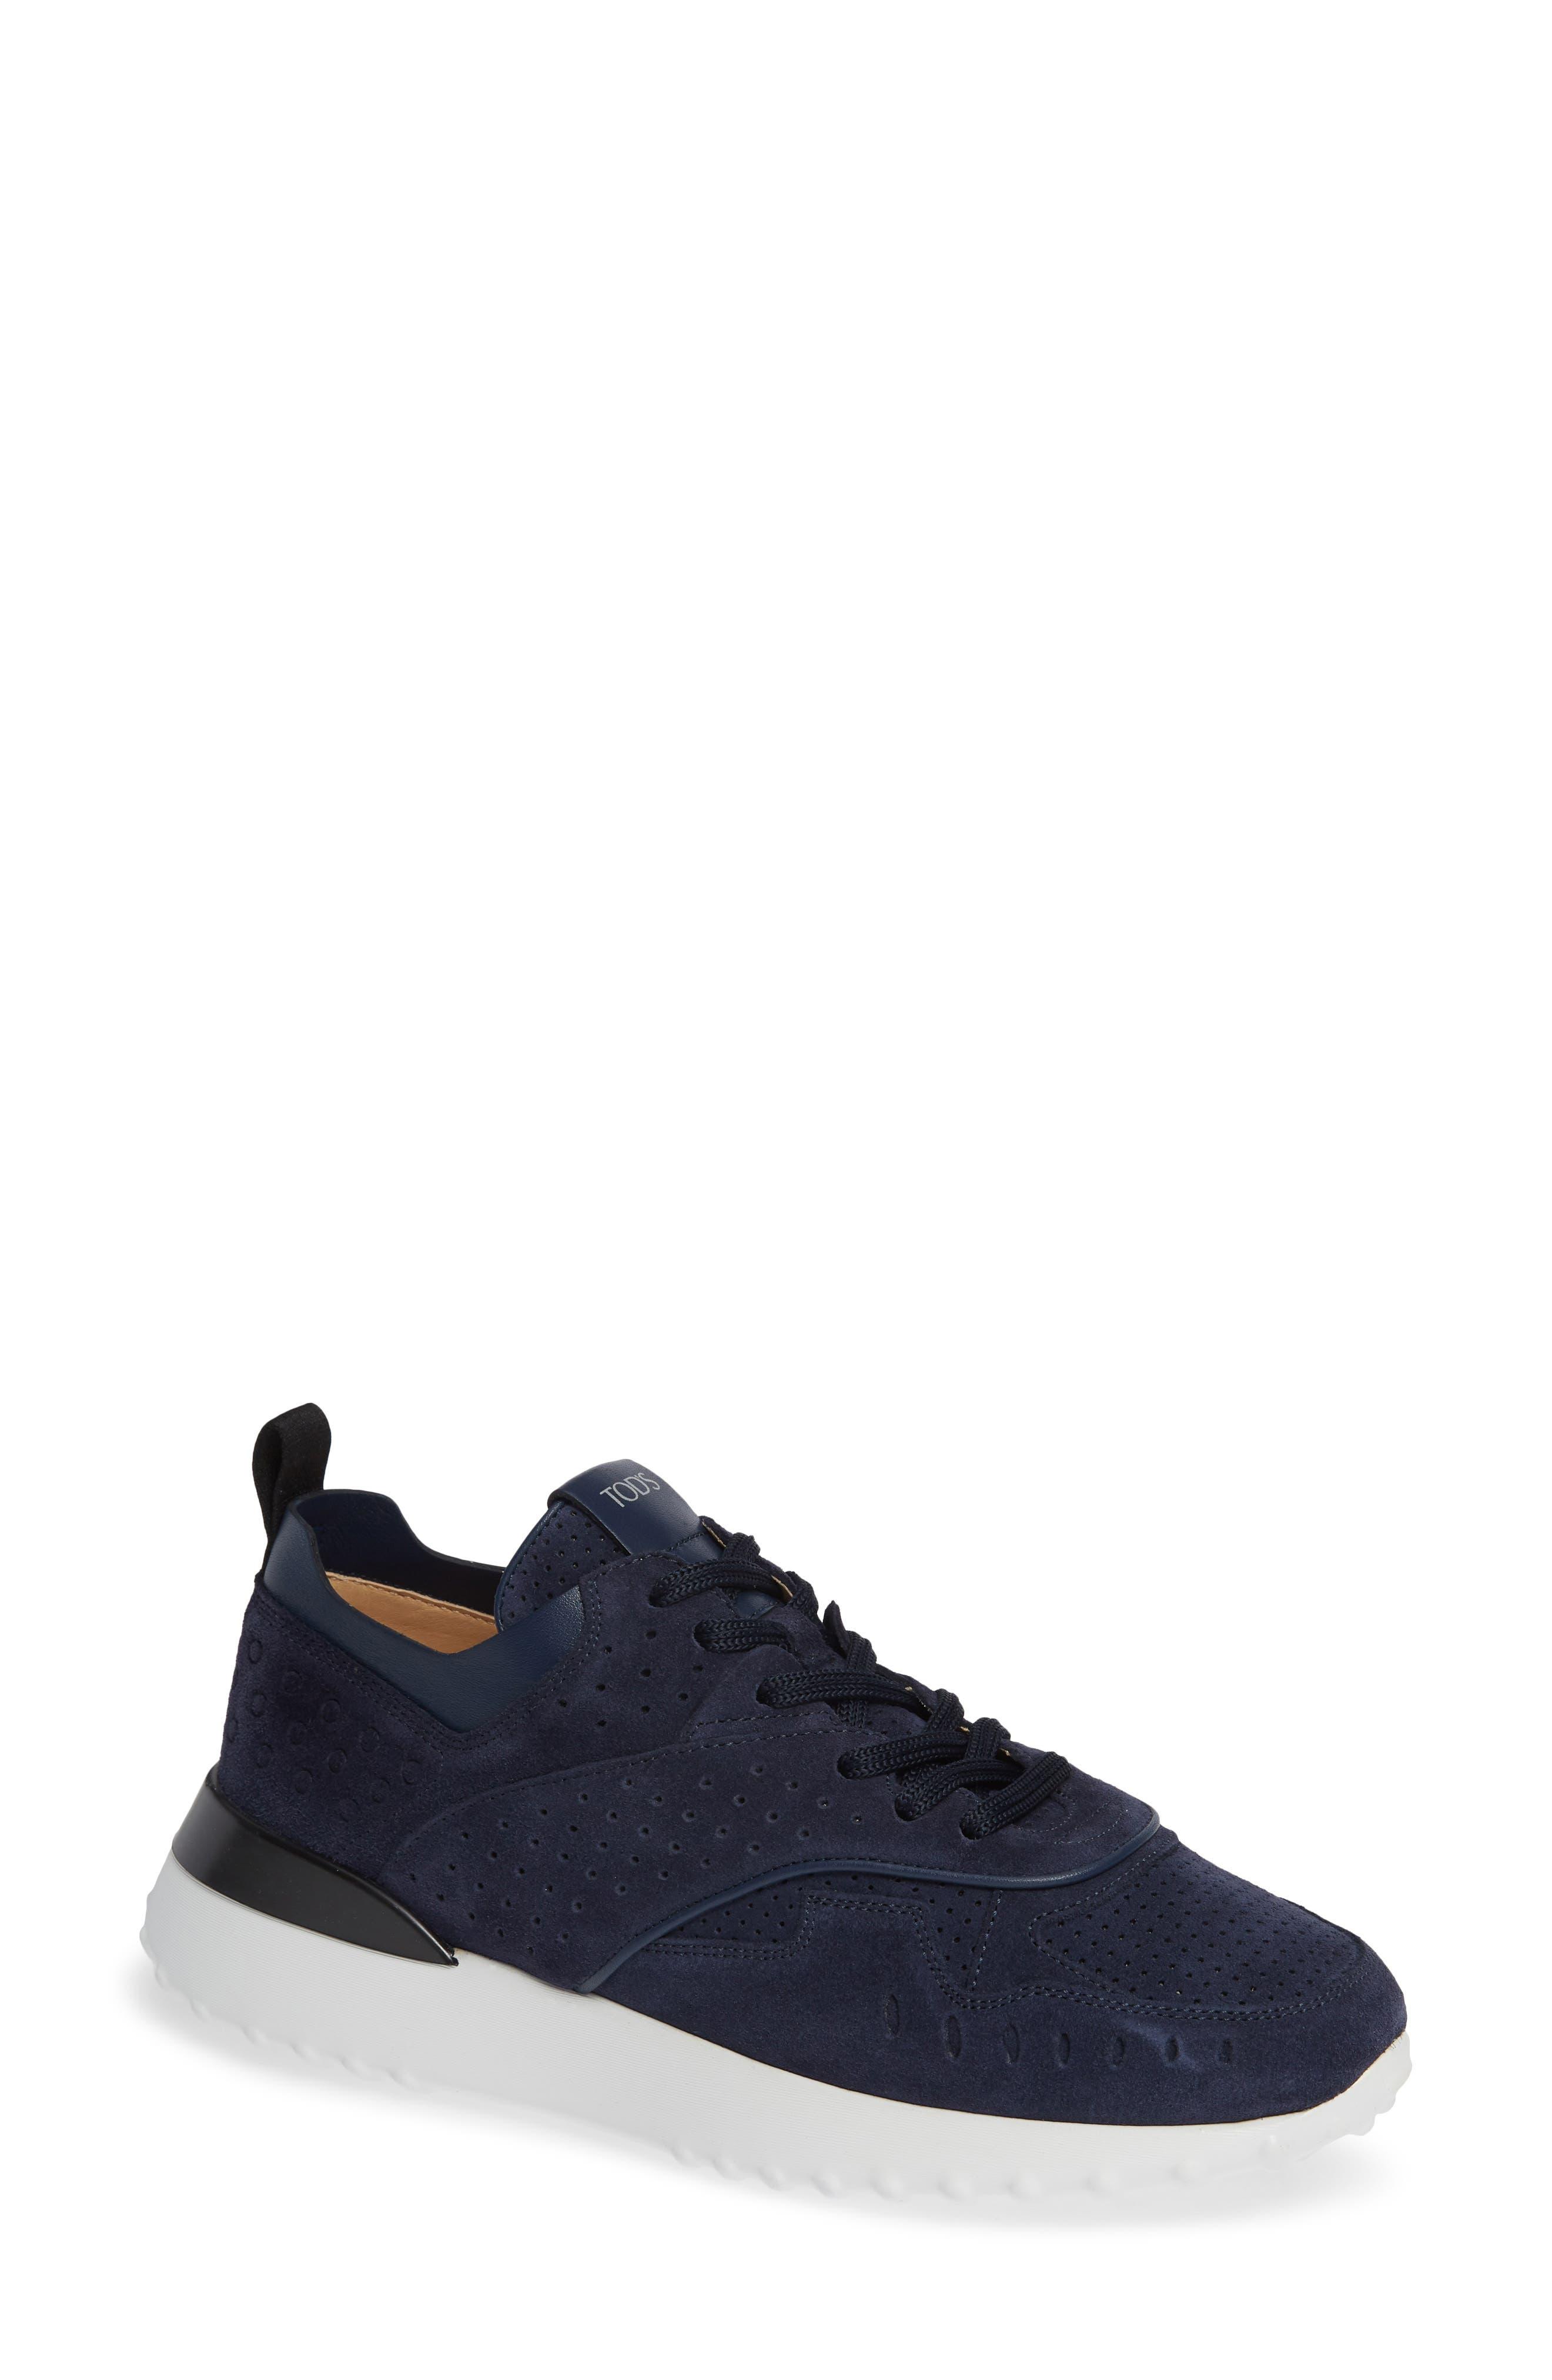 Running Sneaker,                             Main thumbnail 1, color,                             439